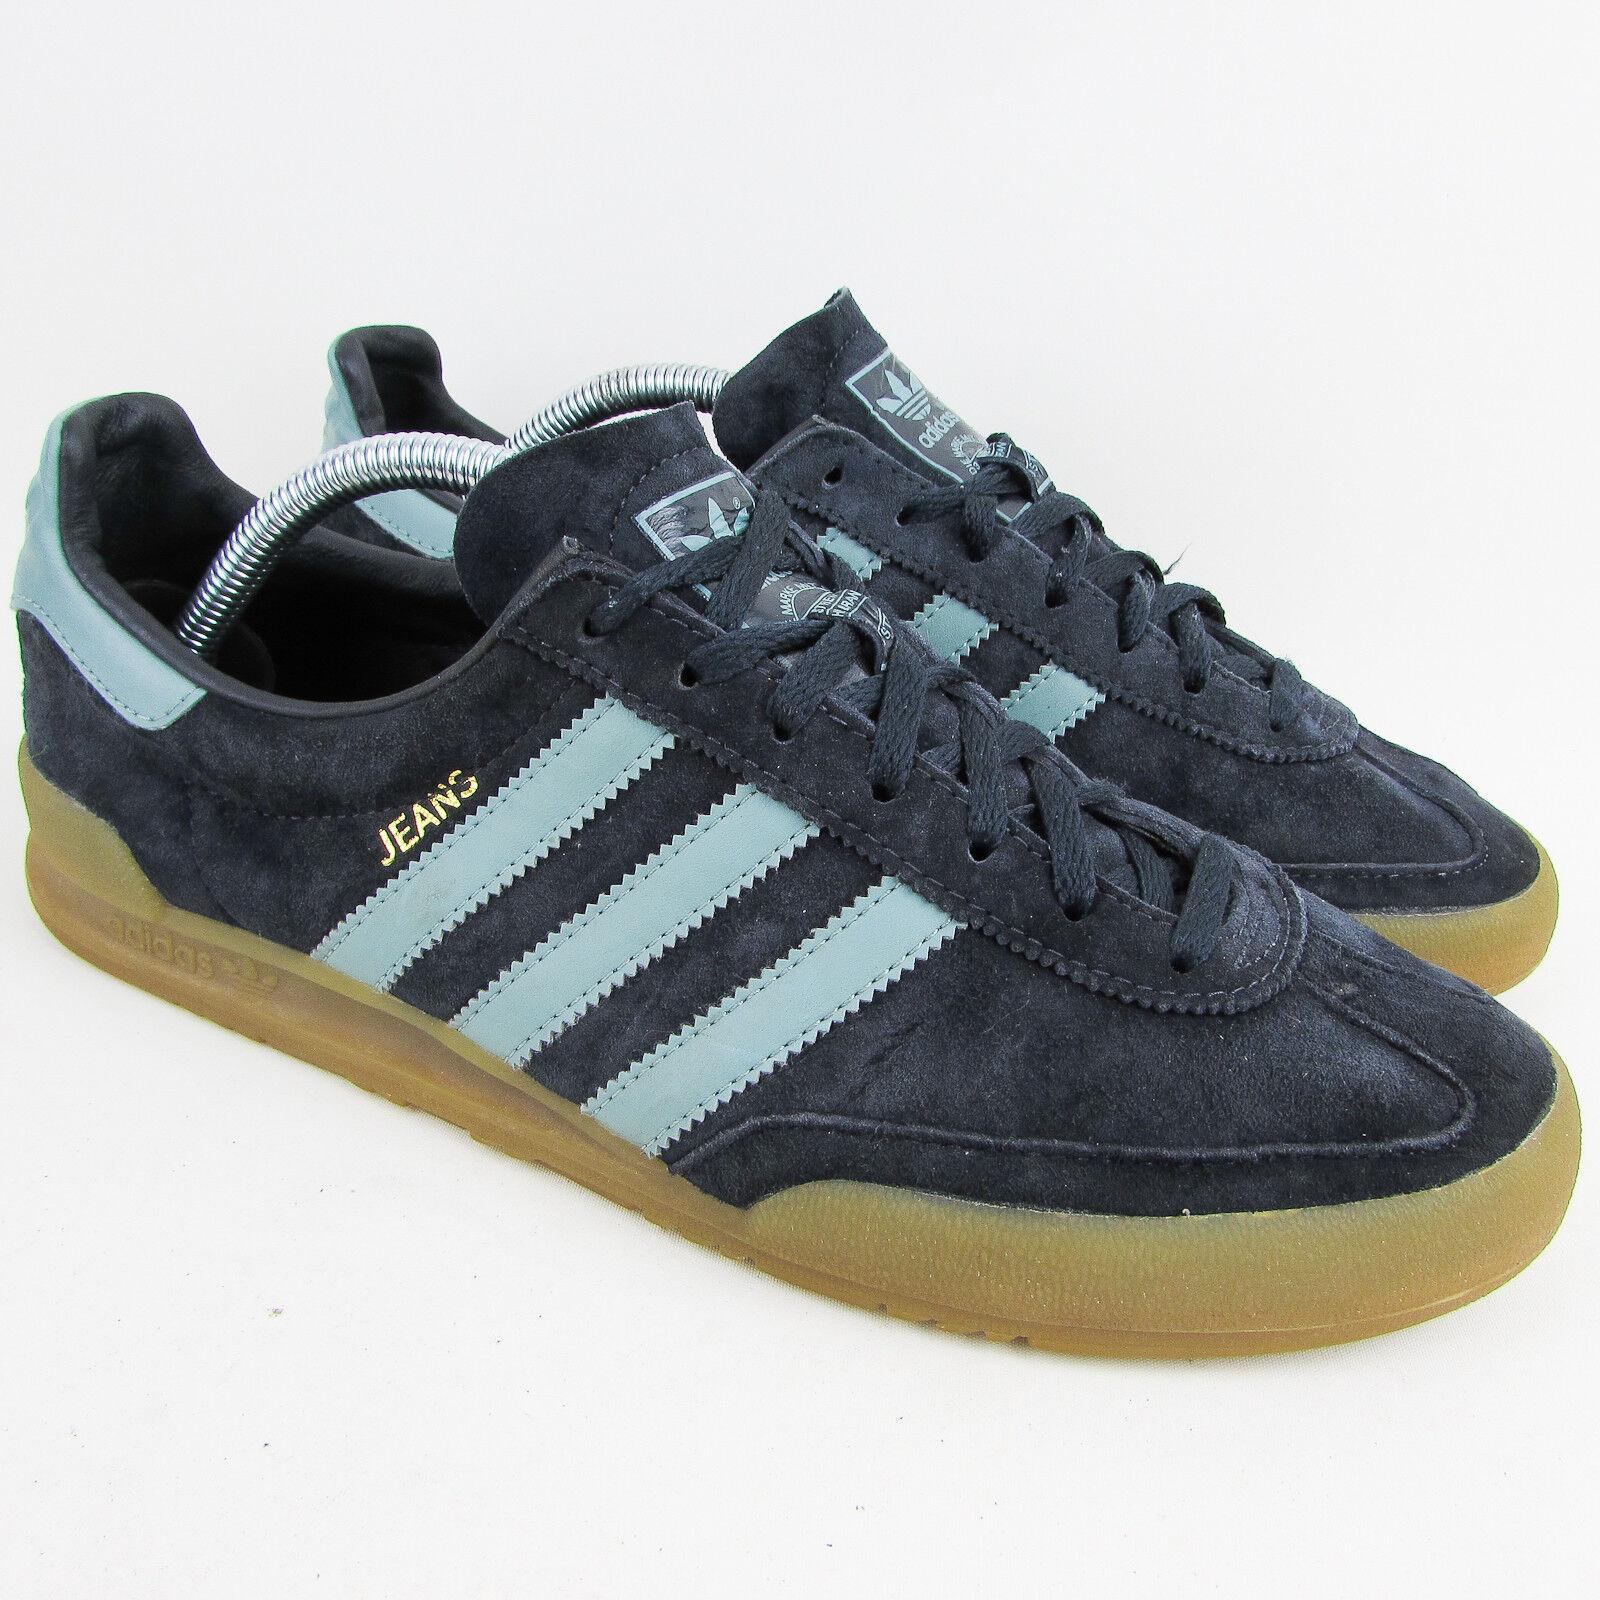 Adidas Originals Jeans Scarpe da Ginnastica argie CW BLU NAVY S79997